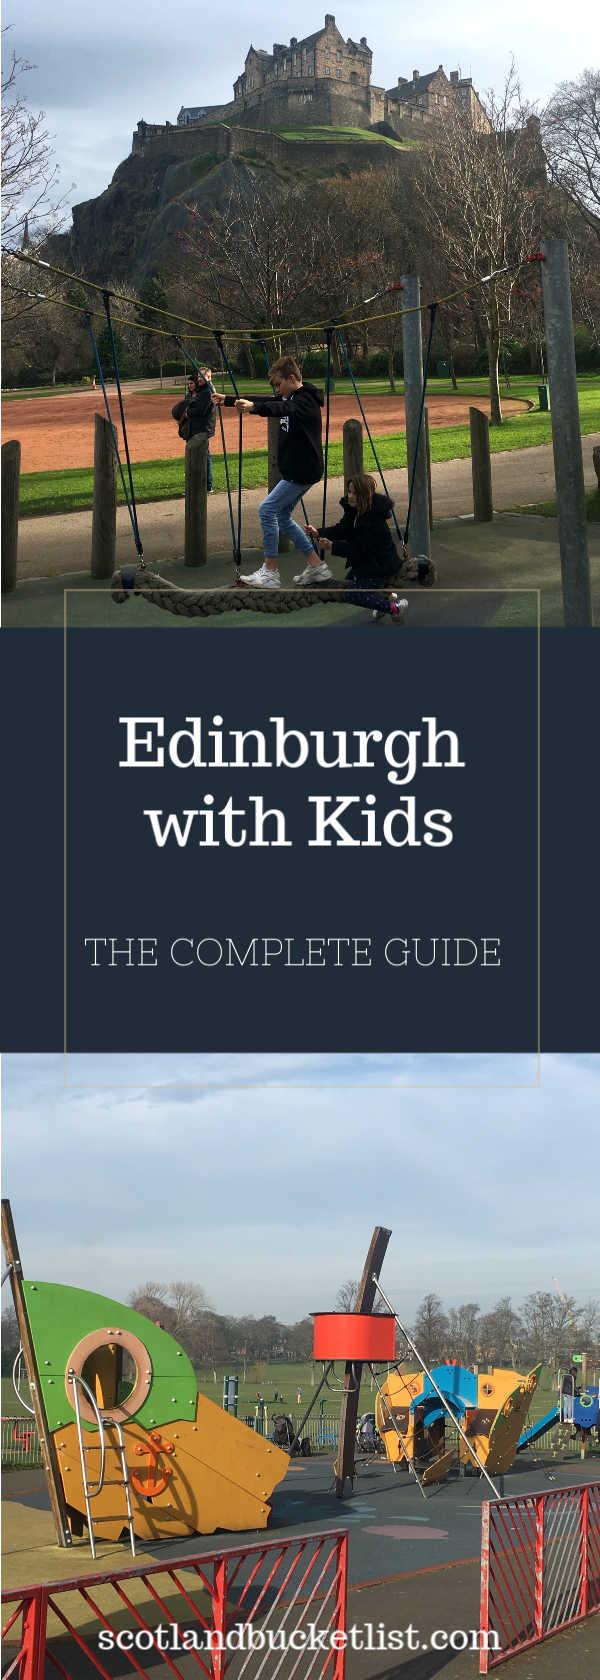 Edinburgh with kids - Pinterest Image